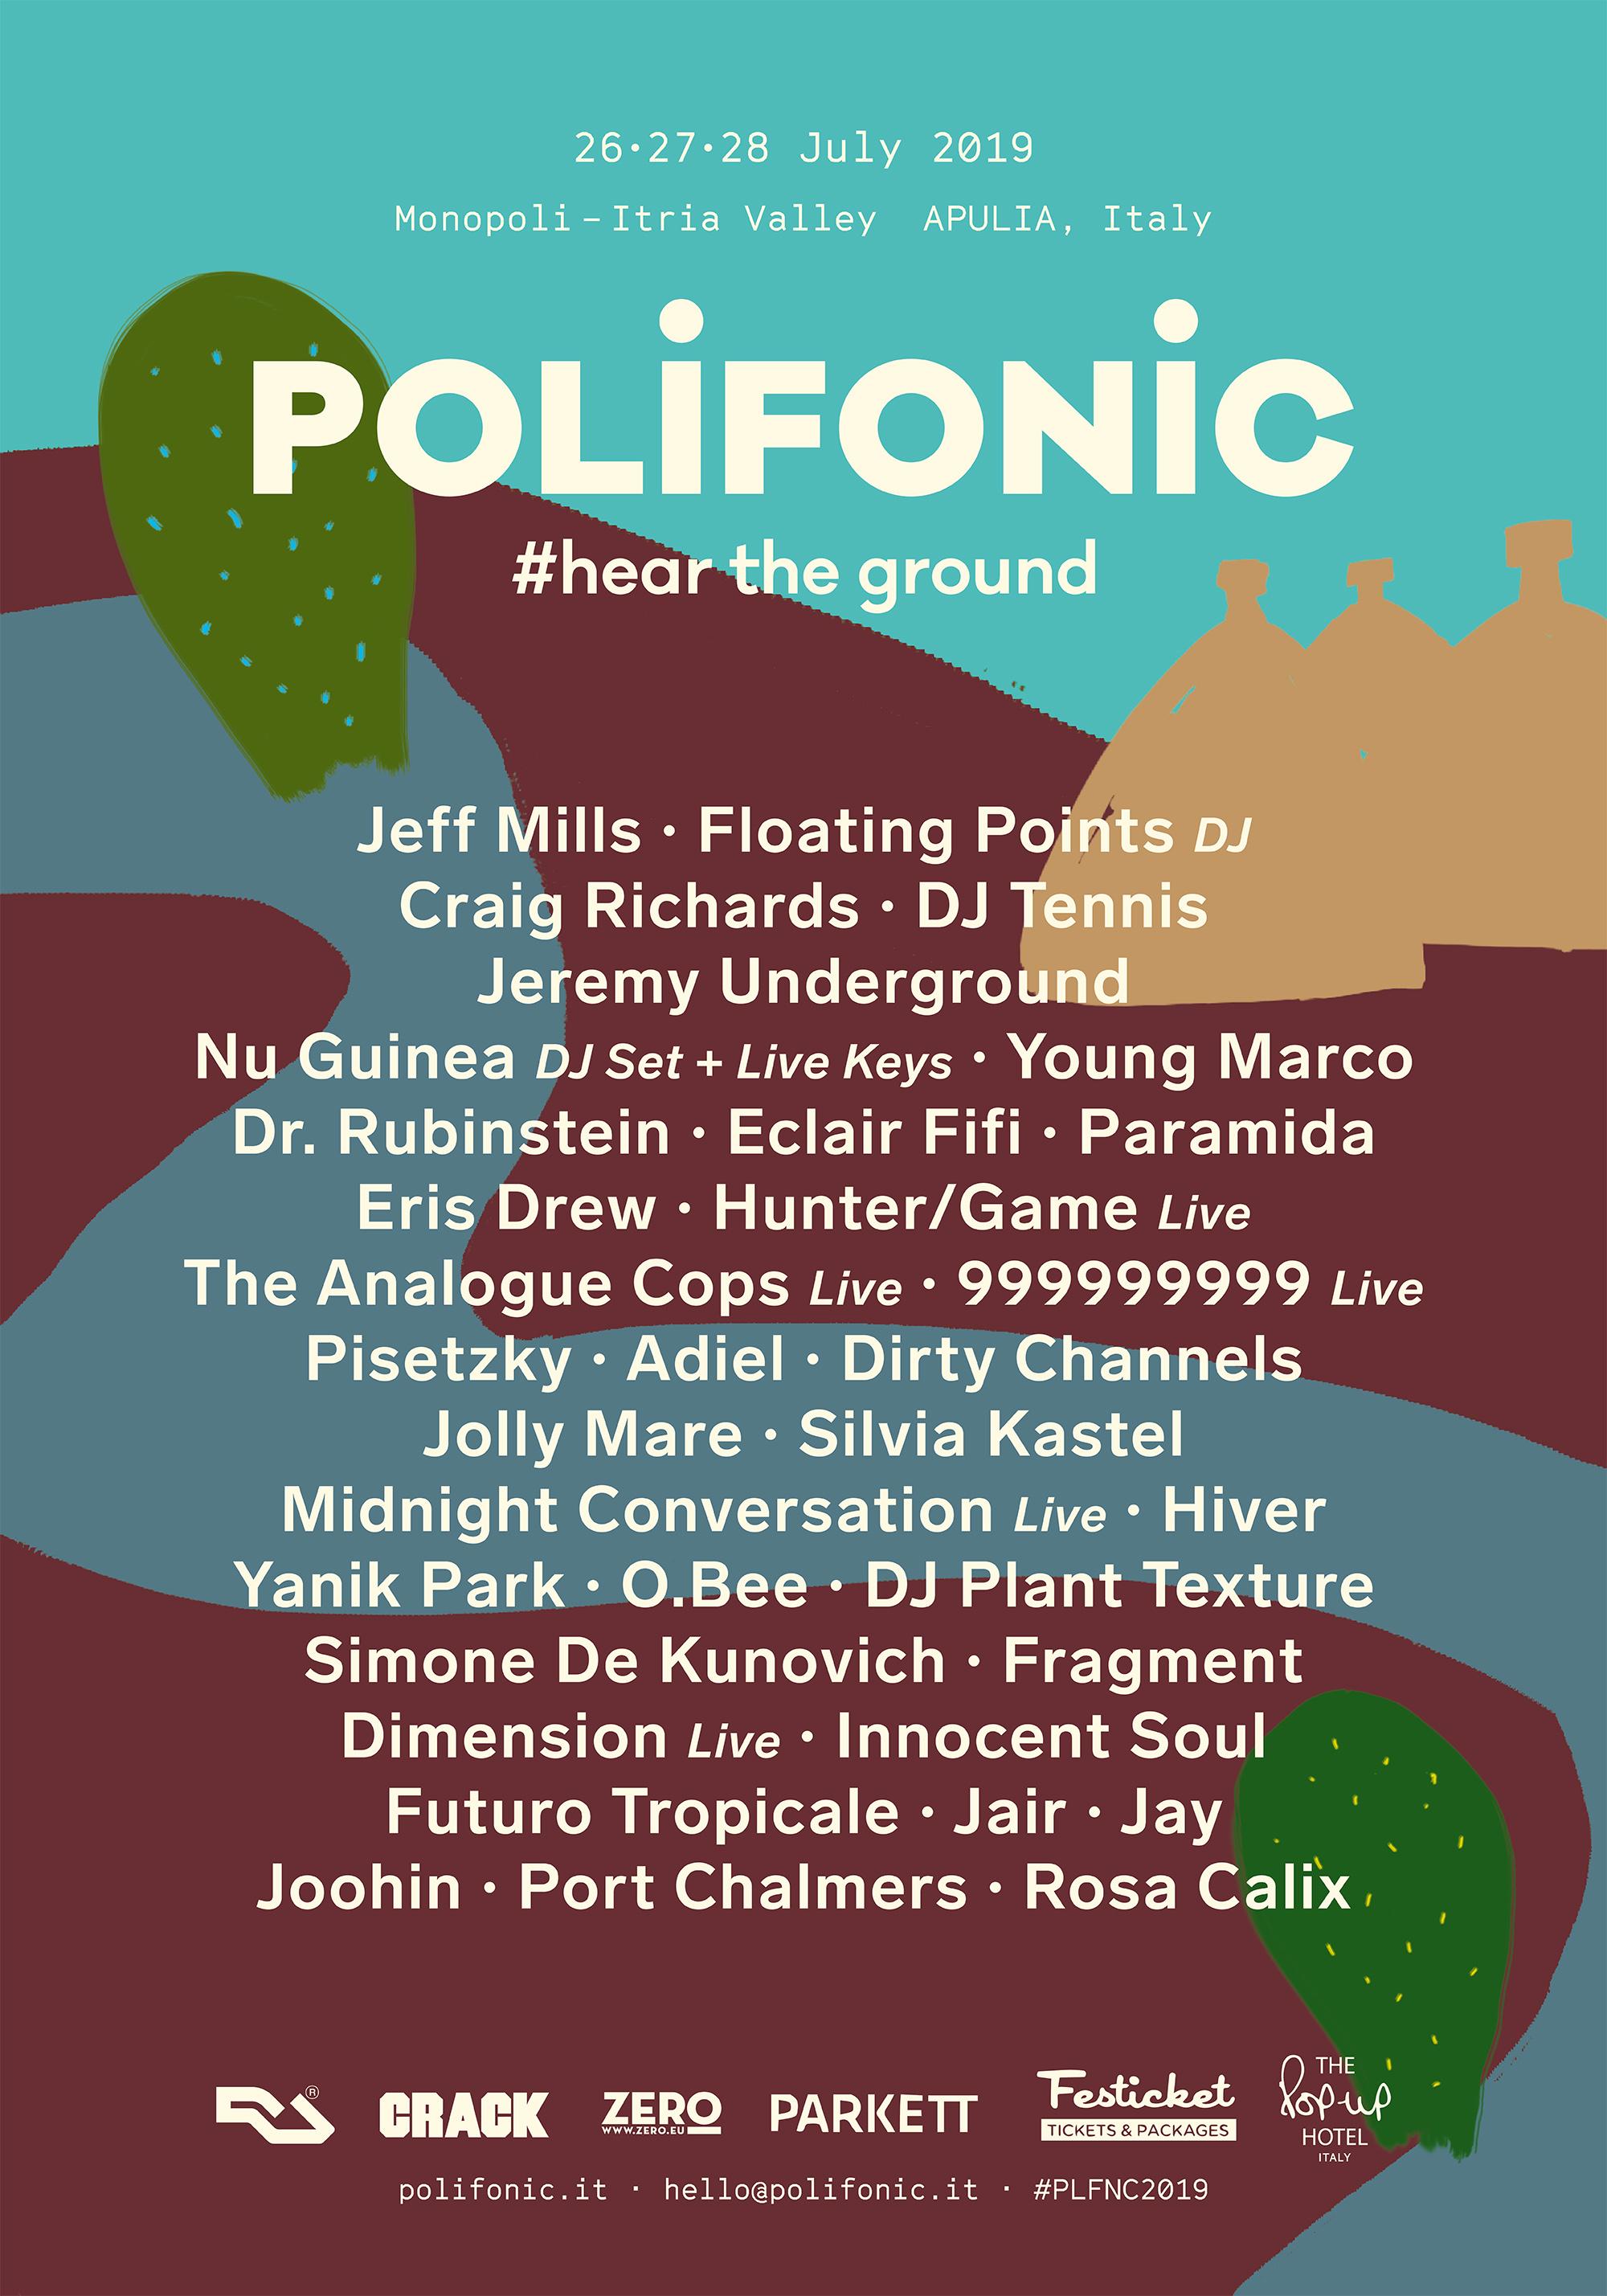 Polifonic 2019